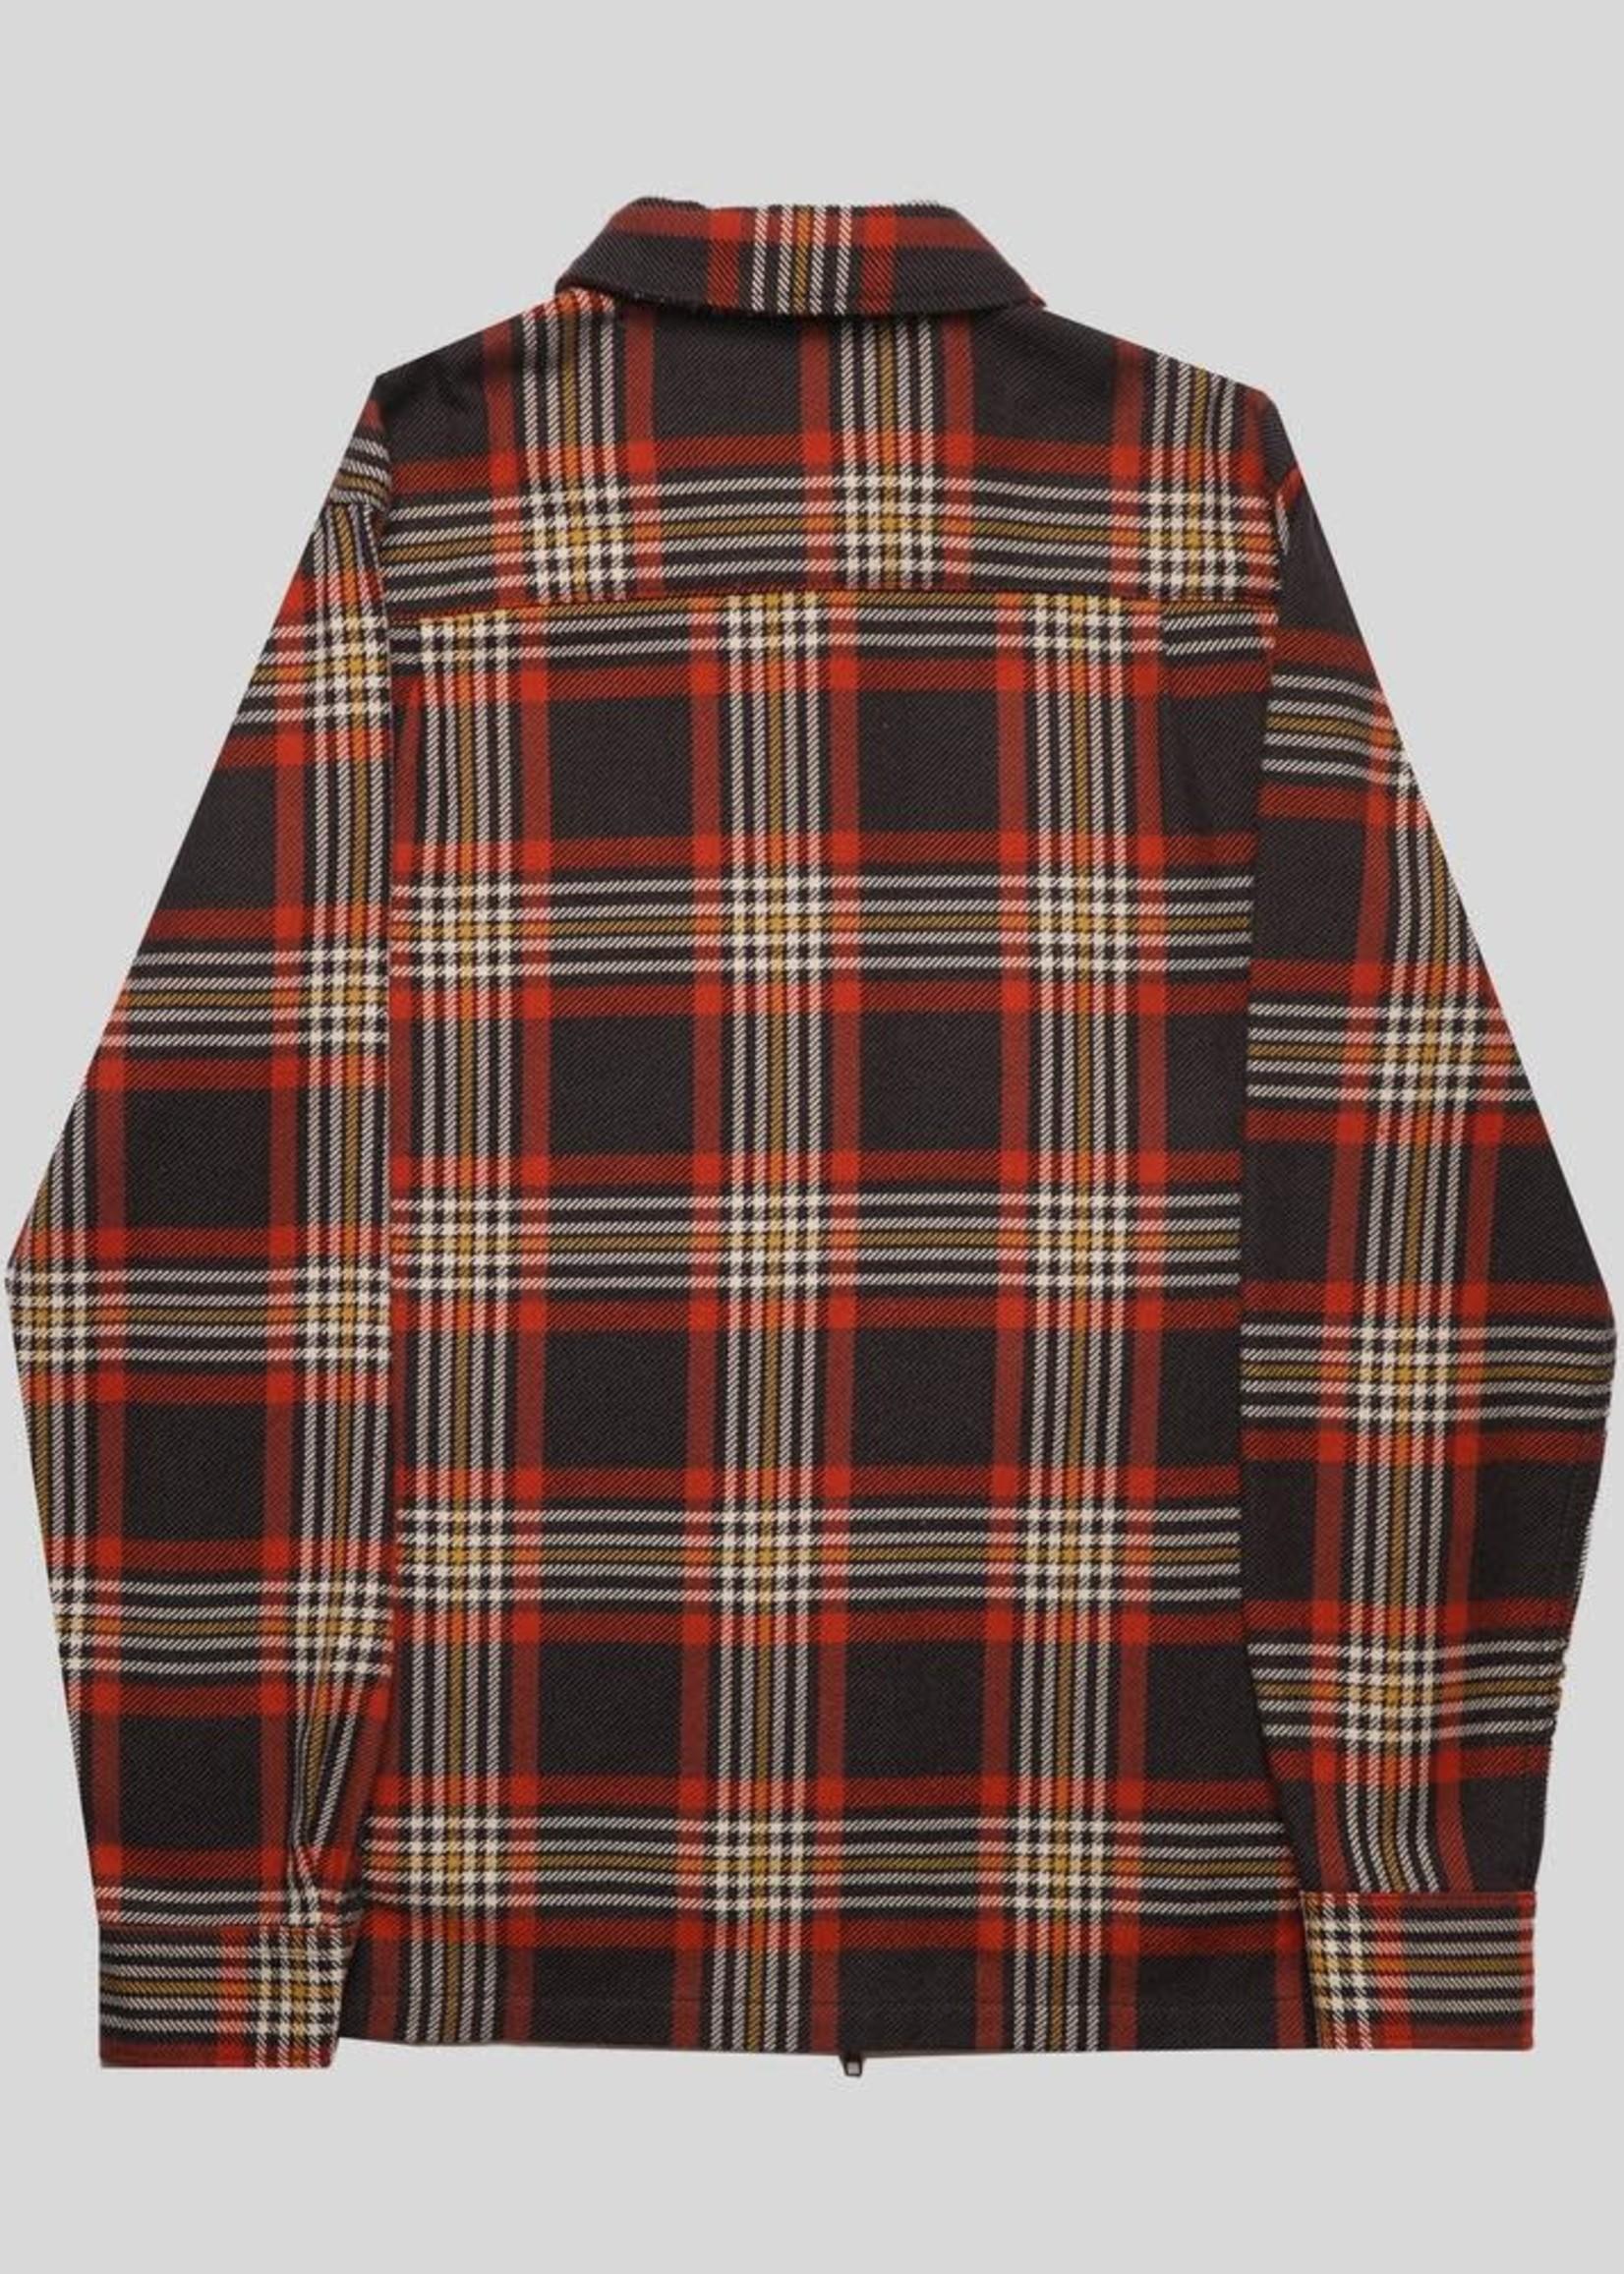 Portuguese Flannel Portuguese Flannel Sofa Zipper Shirt Jacket Multi Plaid